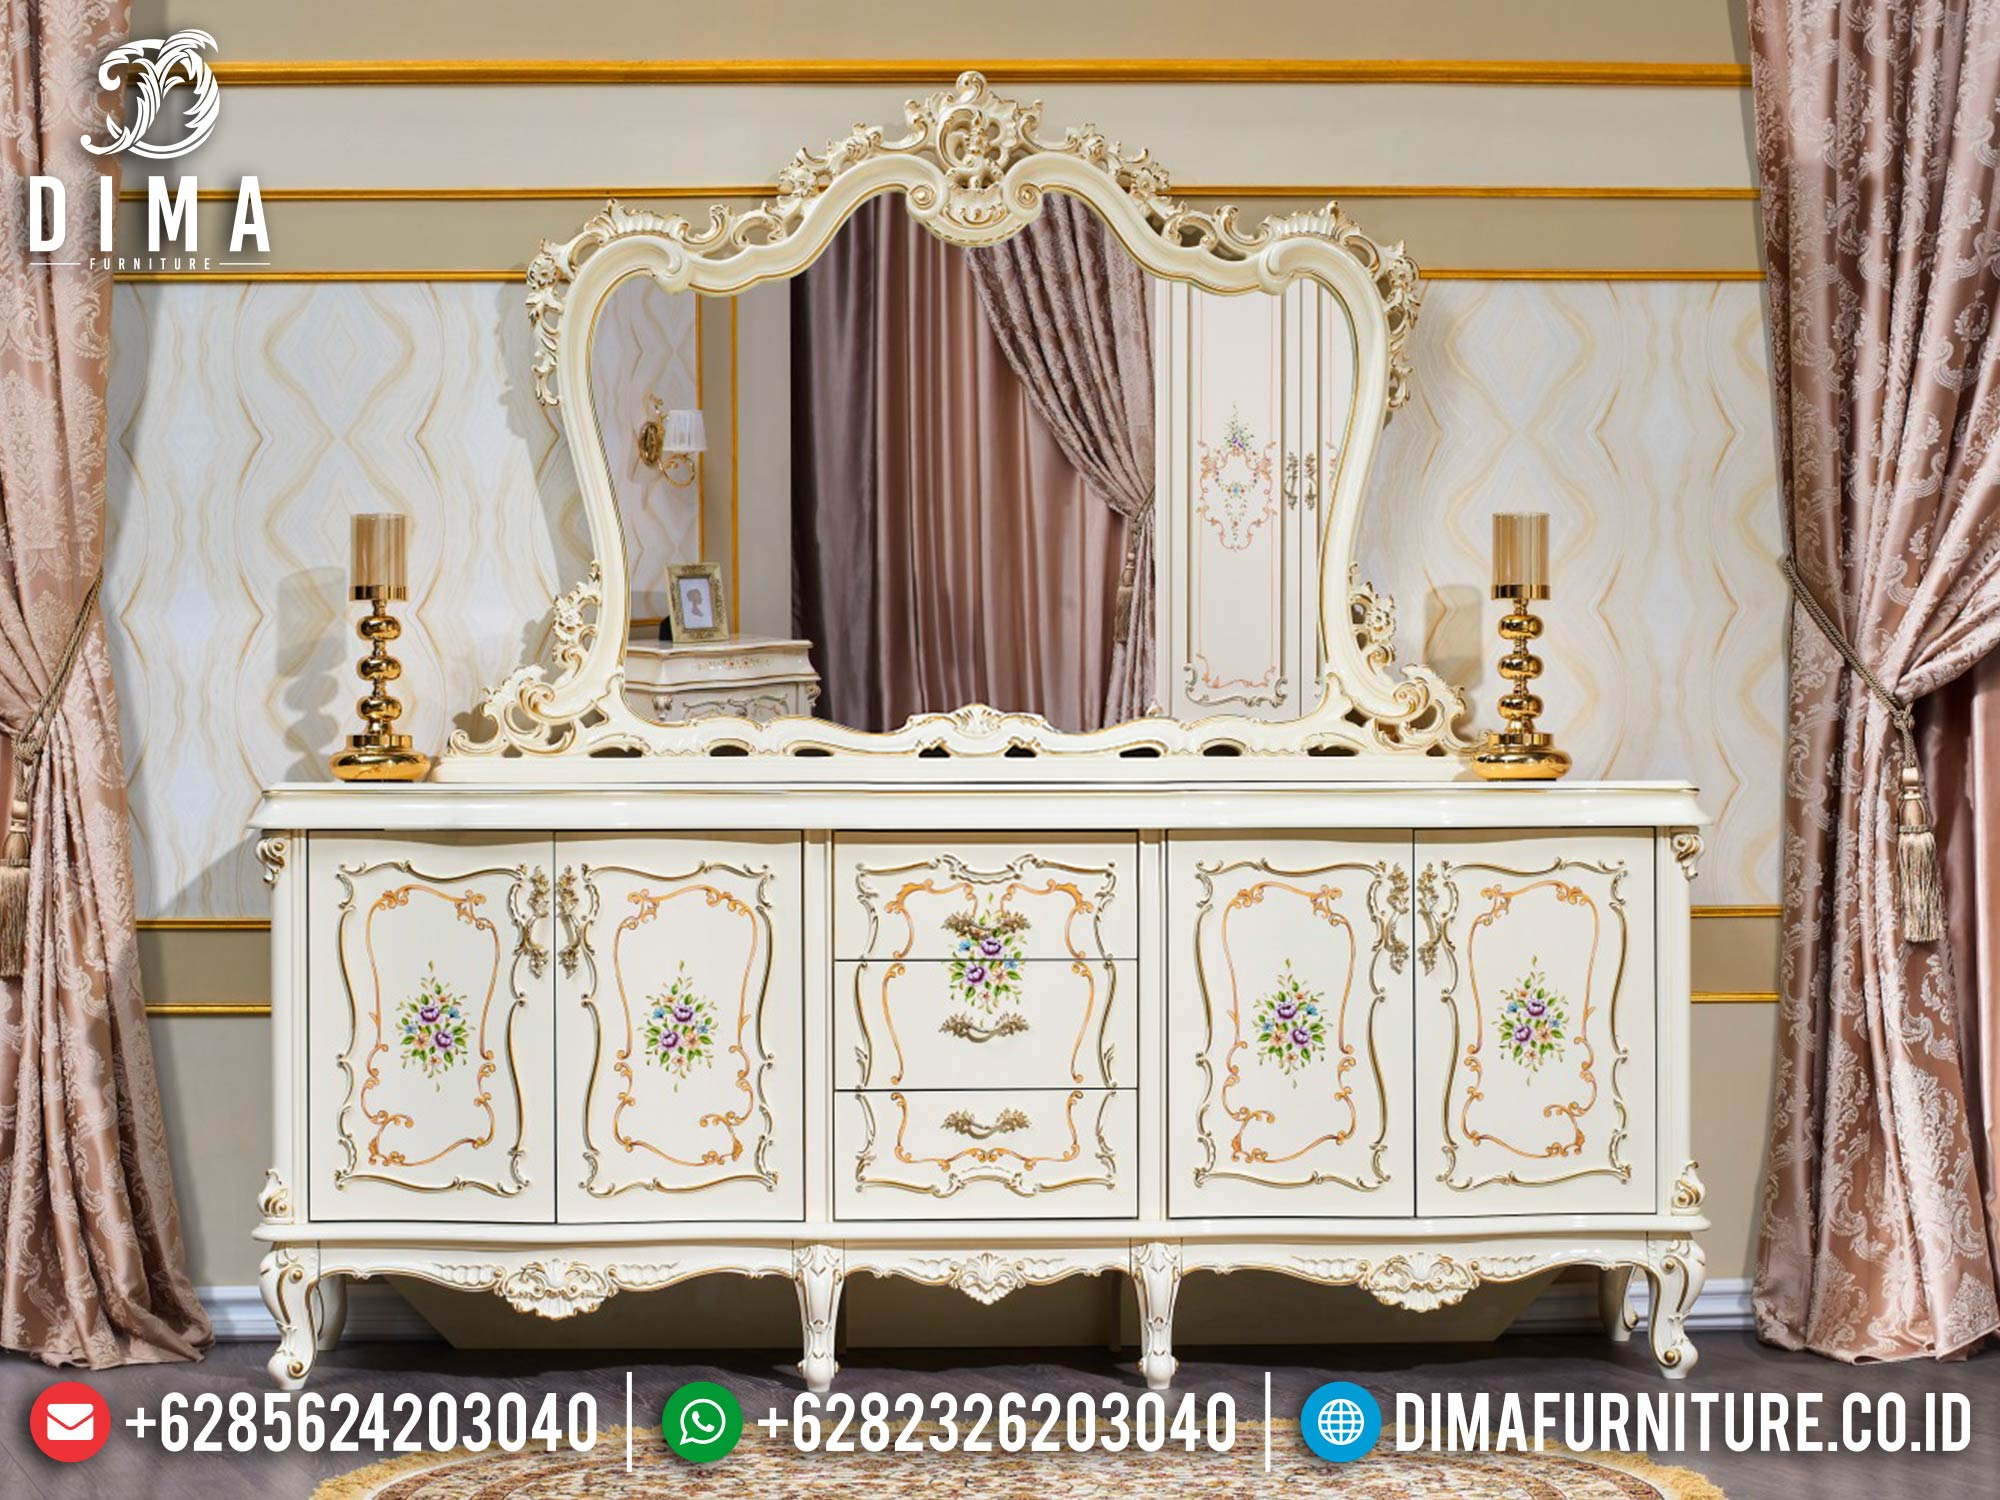 Meja Konsul Mewah Terbaru Ukiran Jepara Luxury Carving High Quality BT-0967